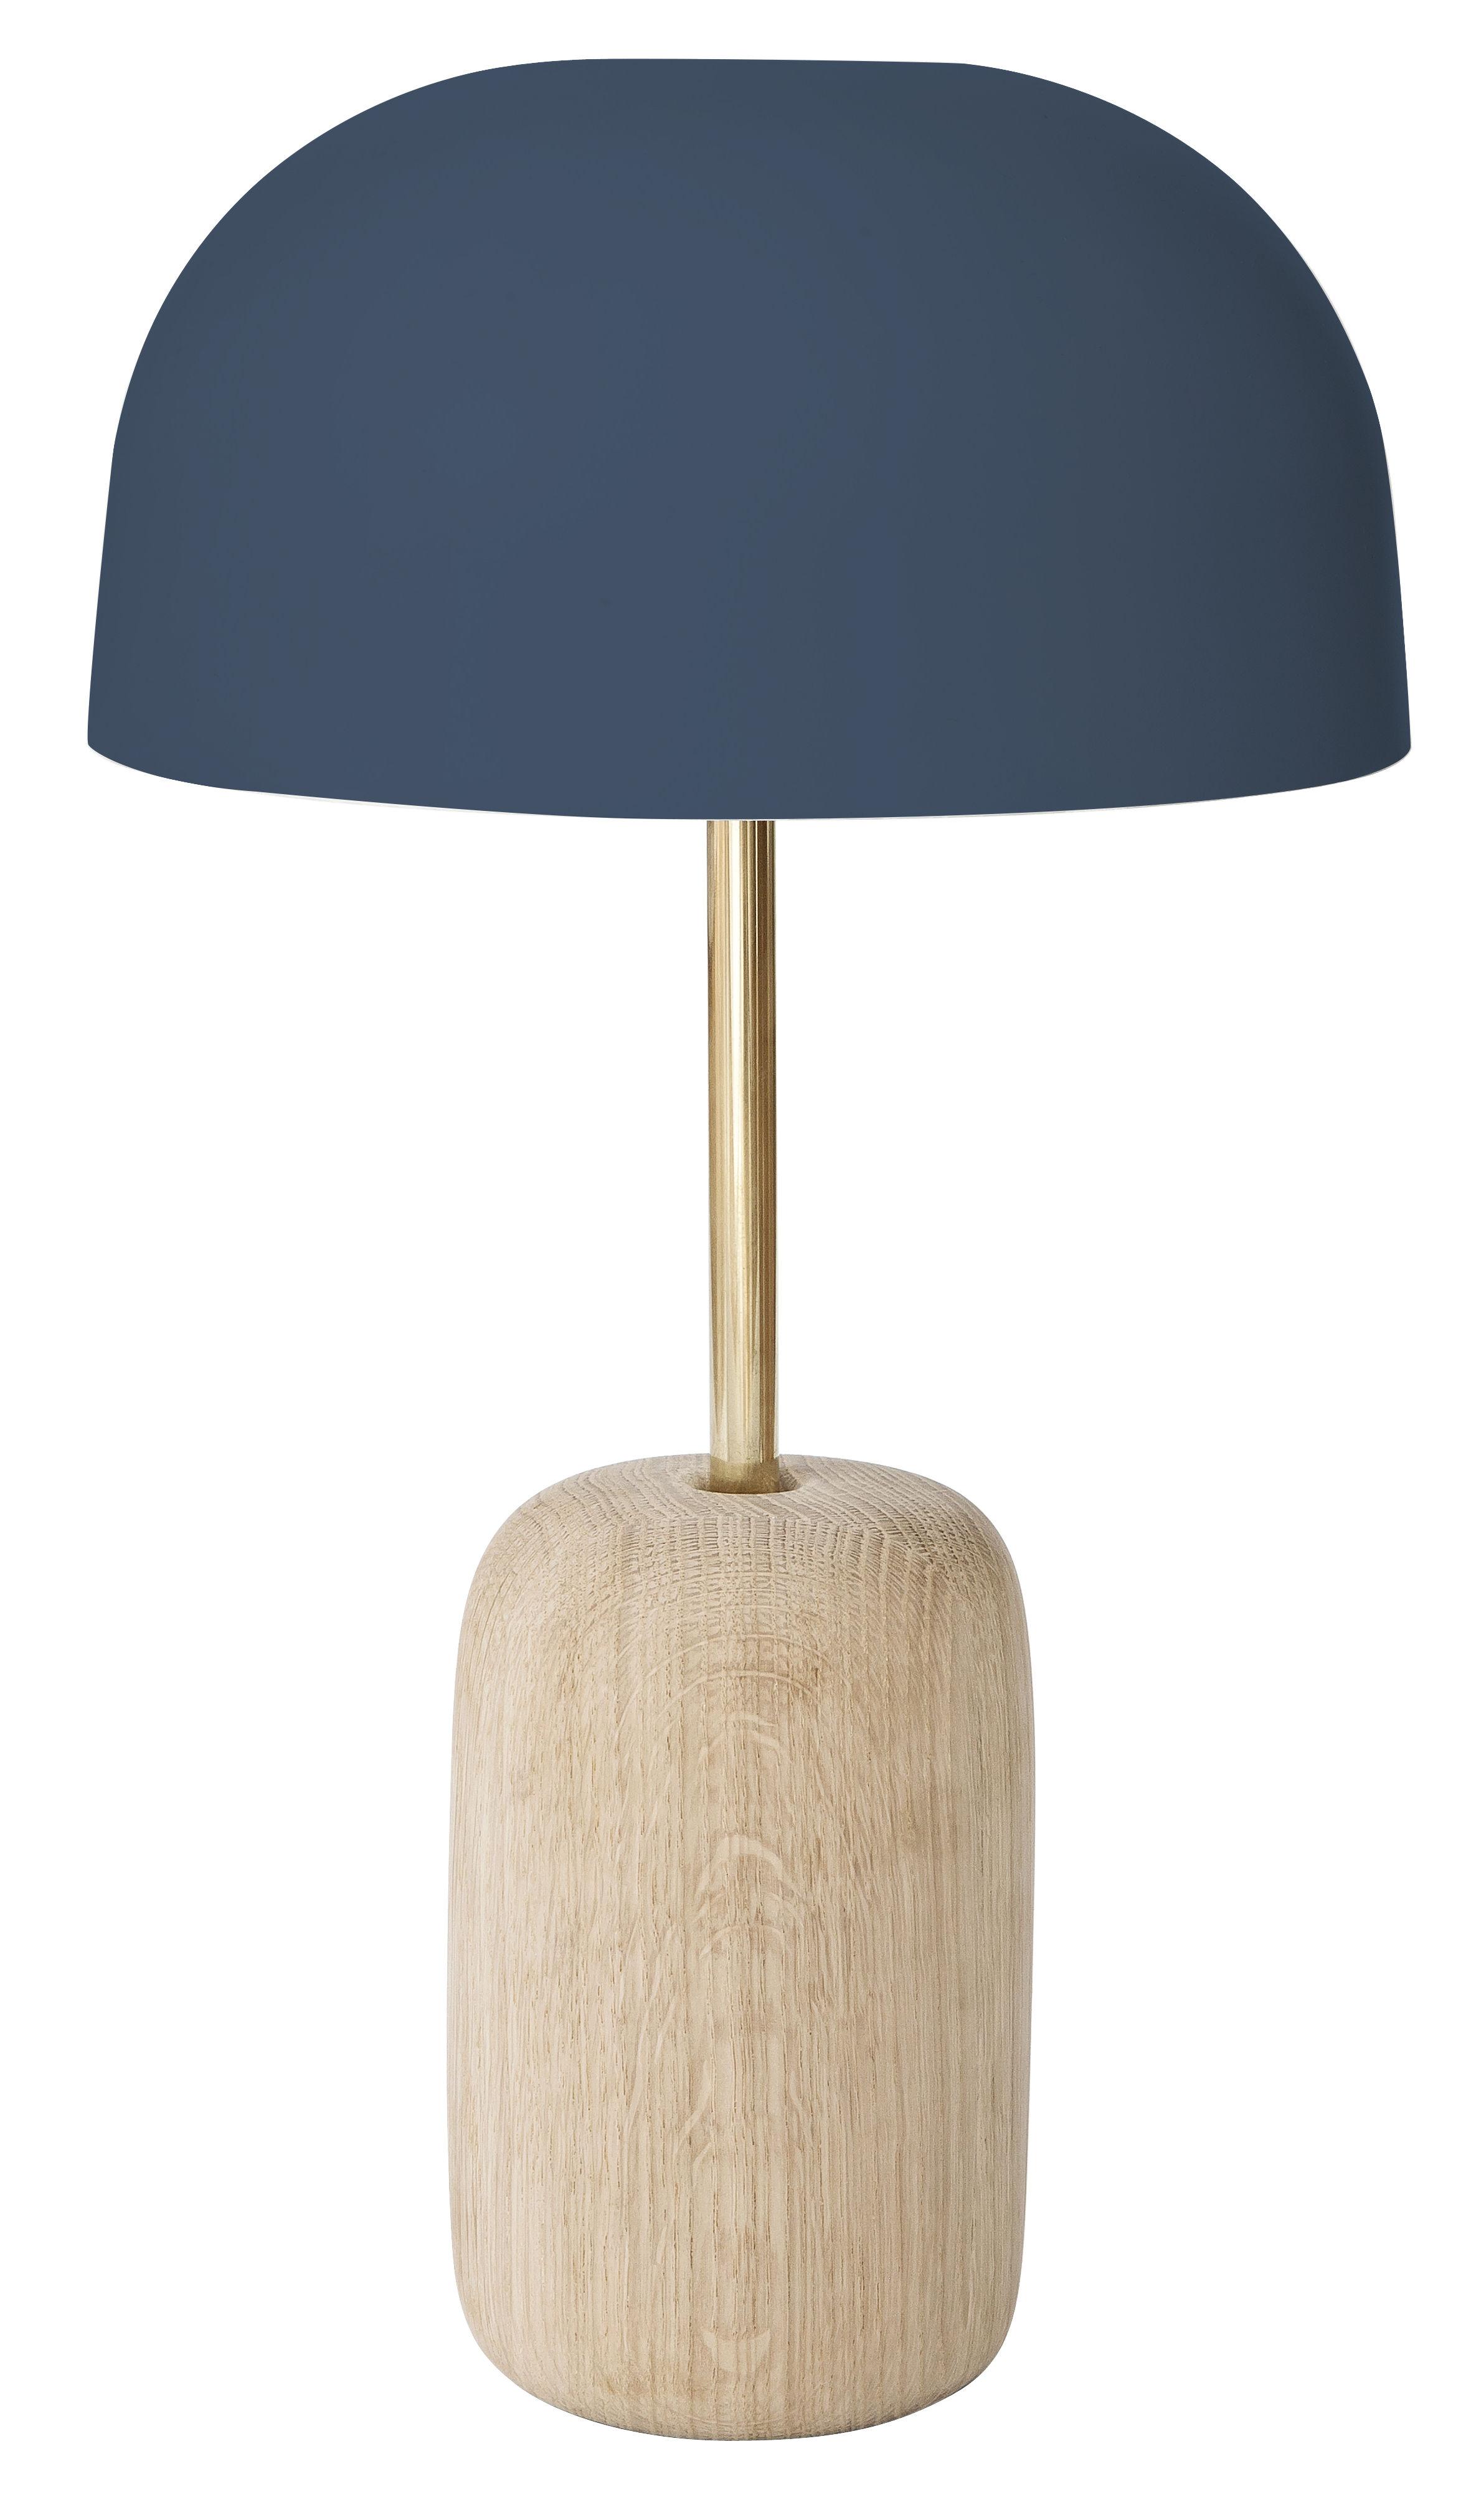 Luminaire - Lampes de table - Lampe de table Nina / Chêne & métal - Hartô - Bleu gris / Chêne & laiton - Chêne massif, Laiton, Métal laqué